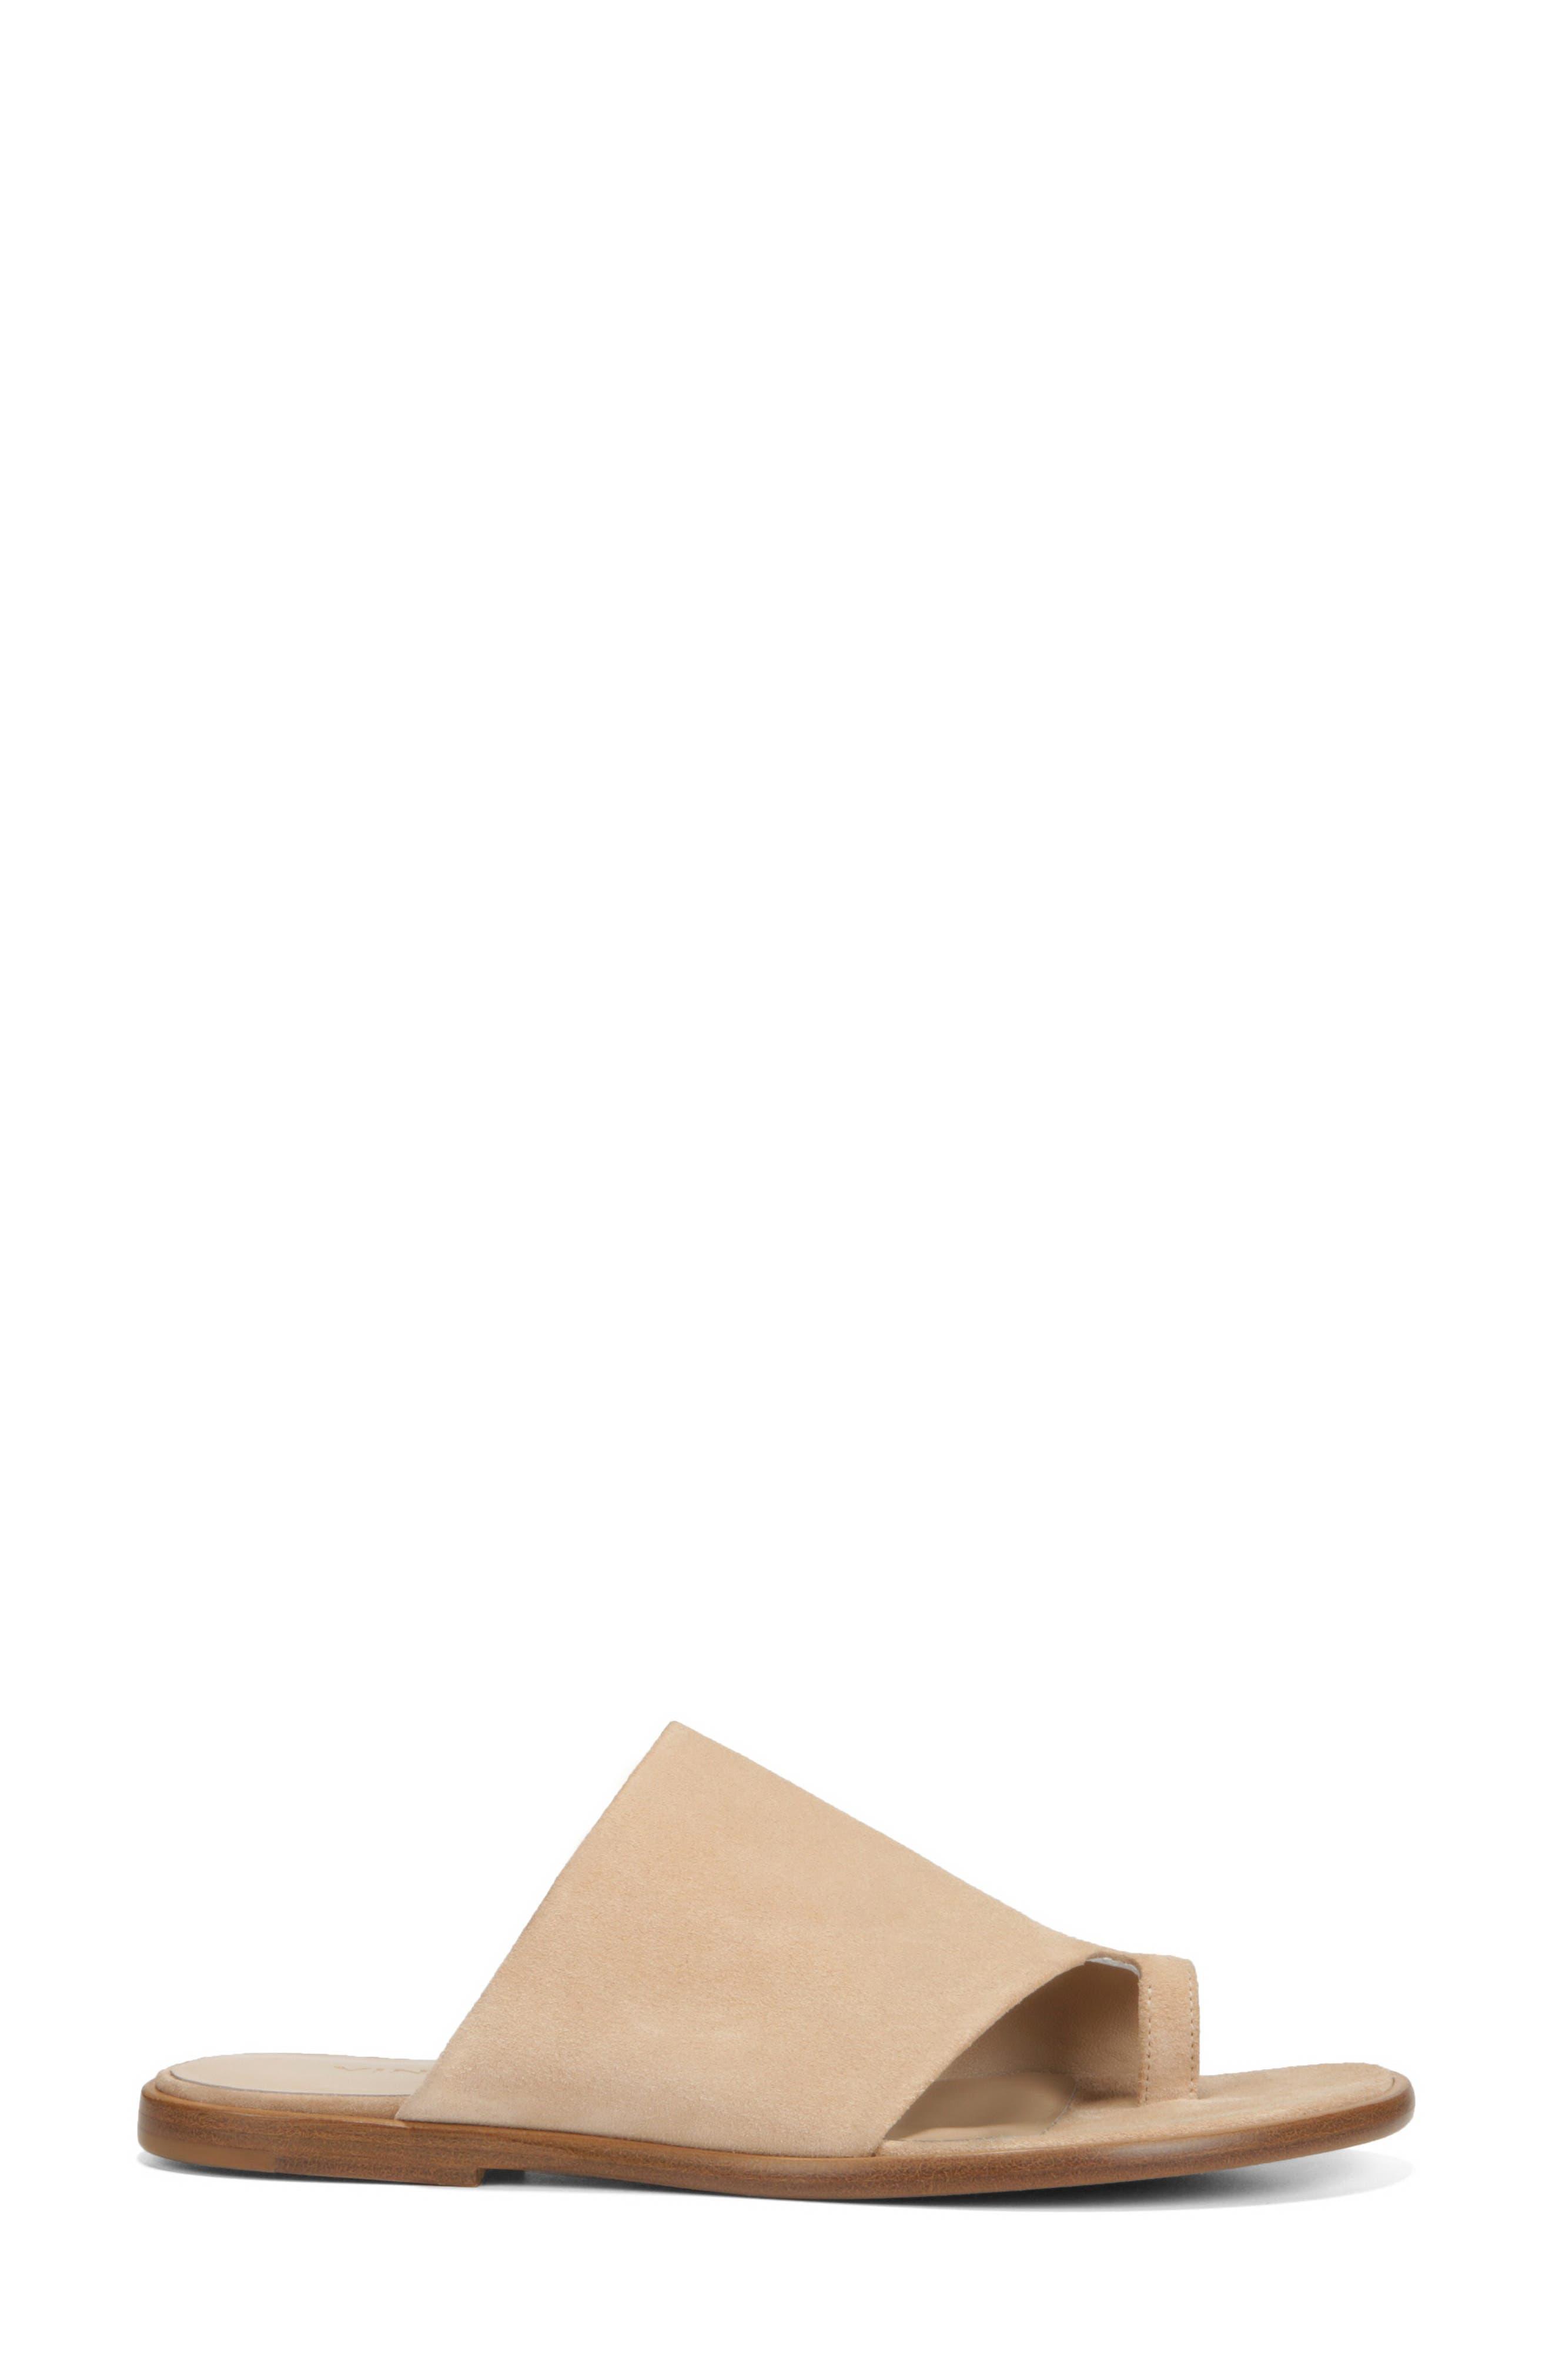 Edris Toe Loop Sandal,                             Alternate thumbnail 3, color,                             SAND